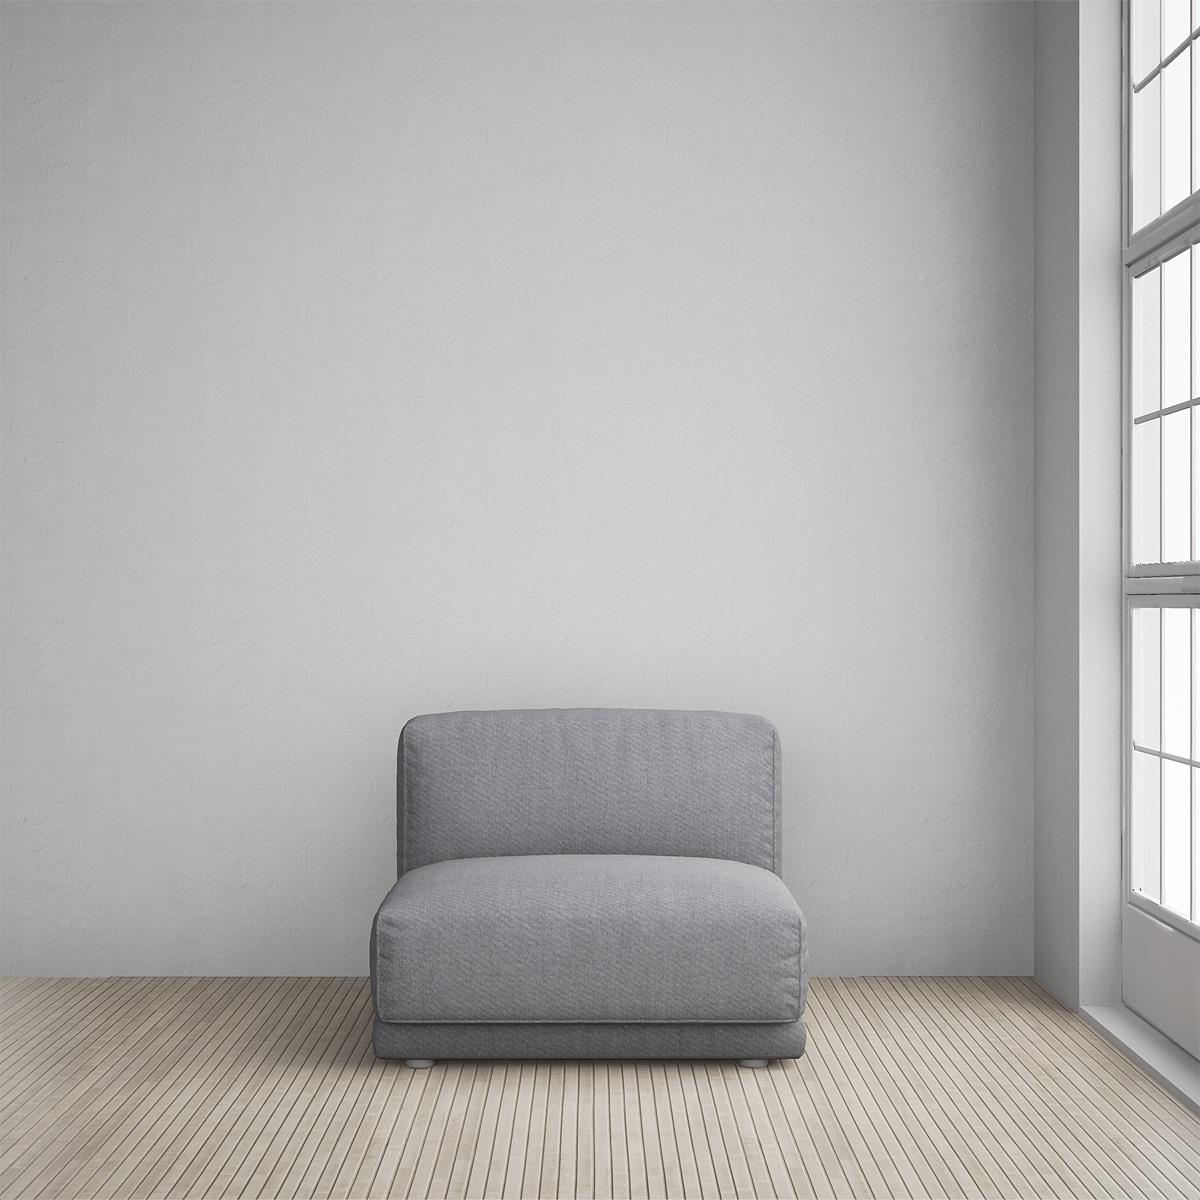 vitra collage sofa module 05 ue4arch. Black Bedroom Furniture Sets. Home Design Ideas